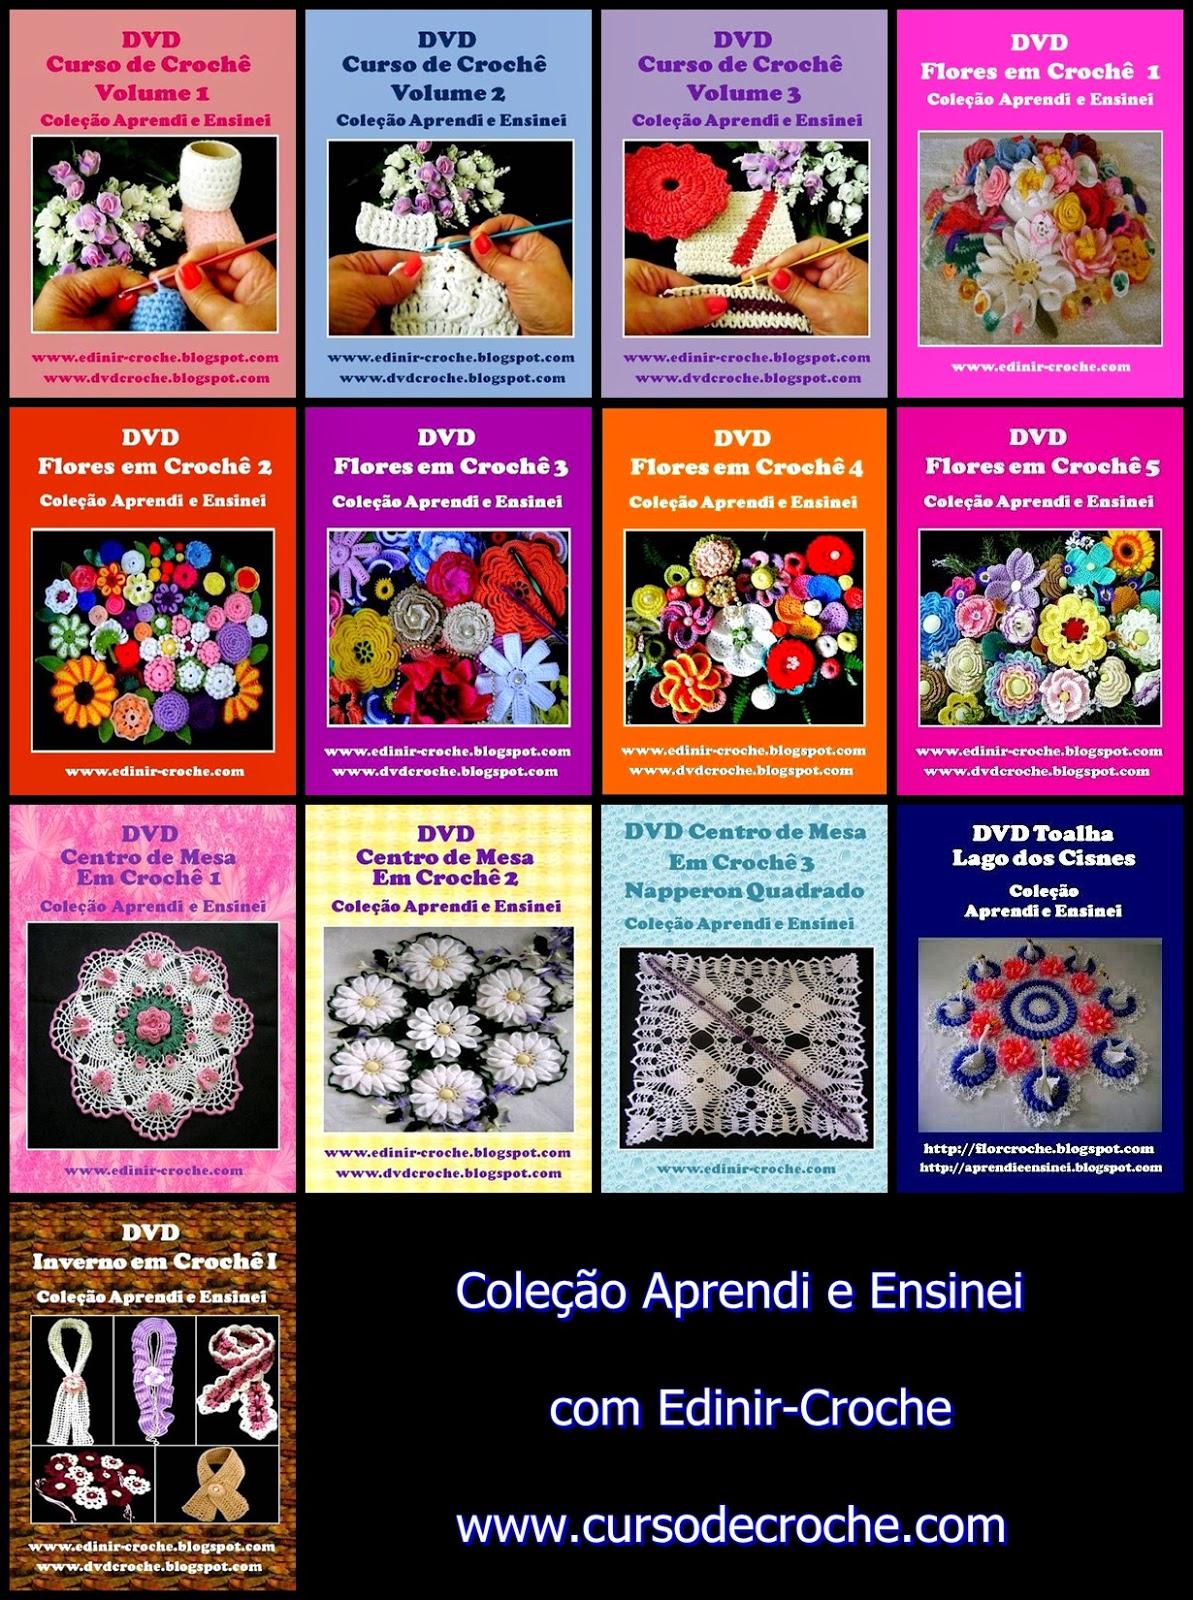 tapetes e variedades de croche com Edinir-Croche na loja curso de croche online